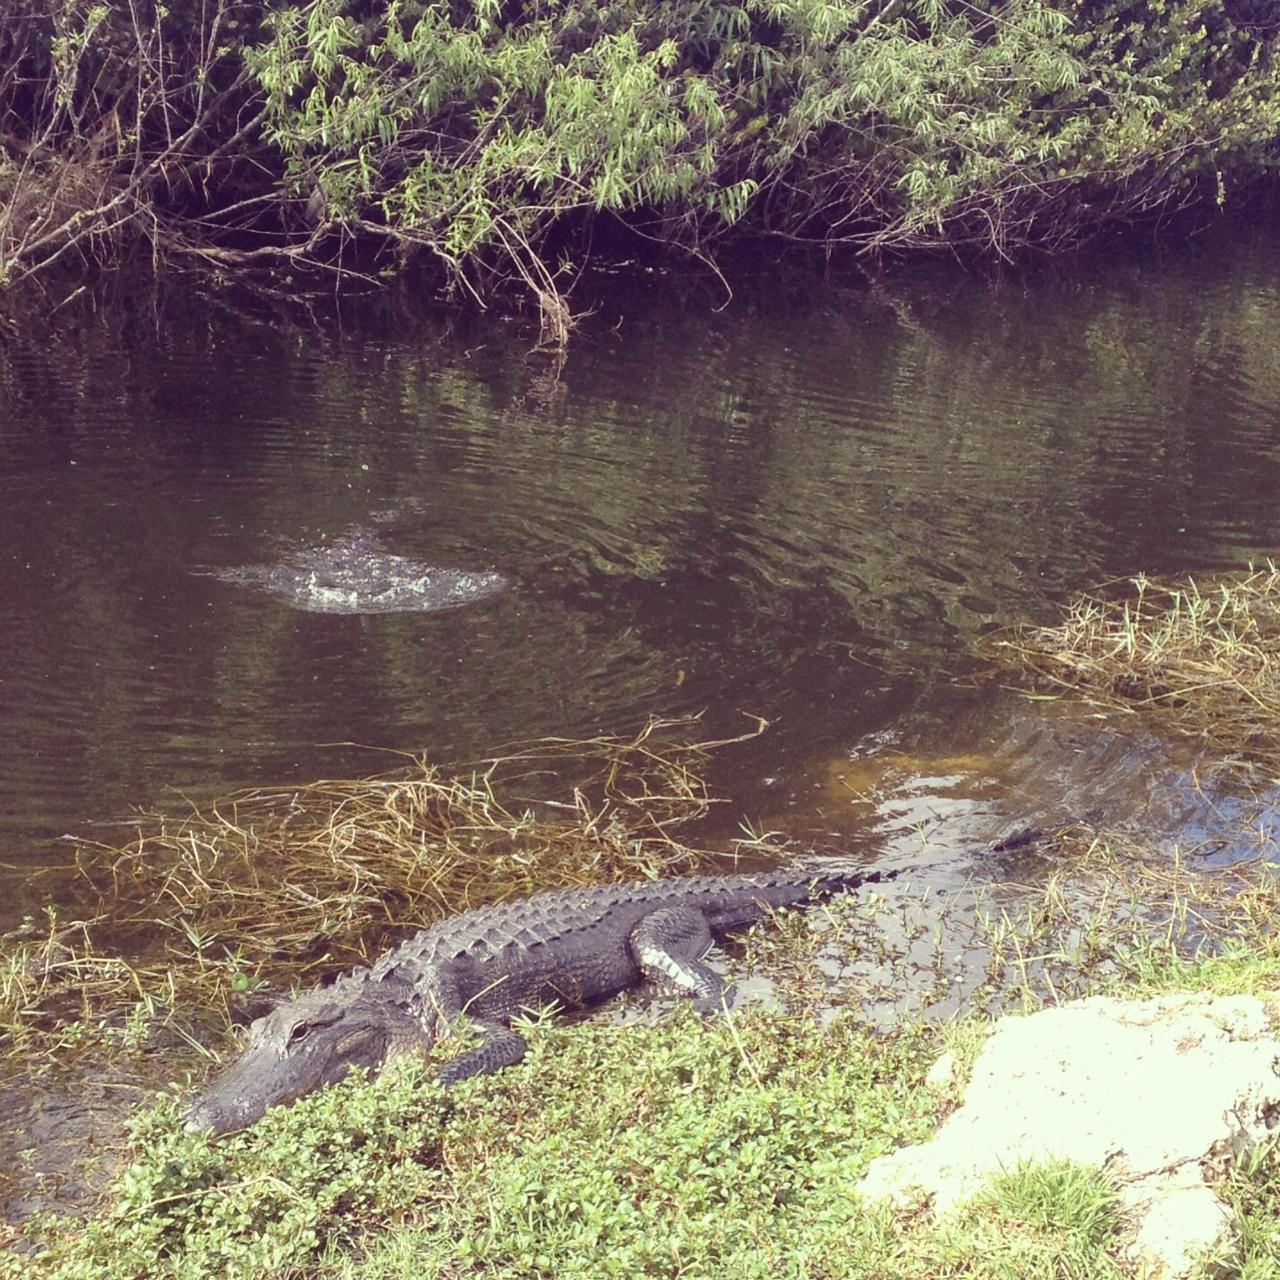 Alligator 3.JPG